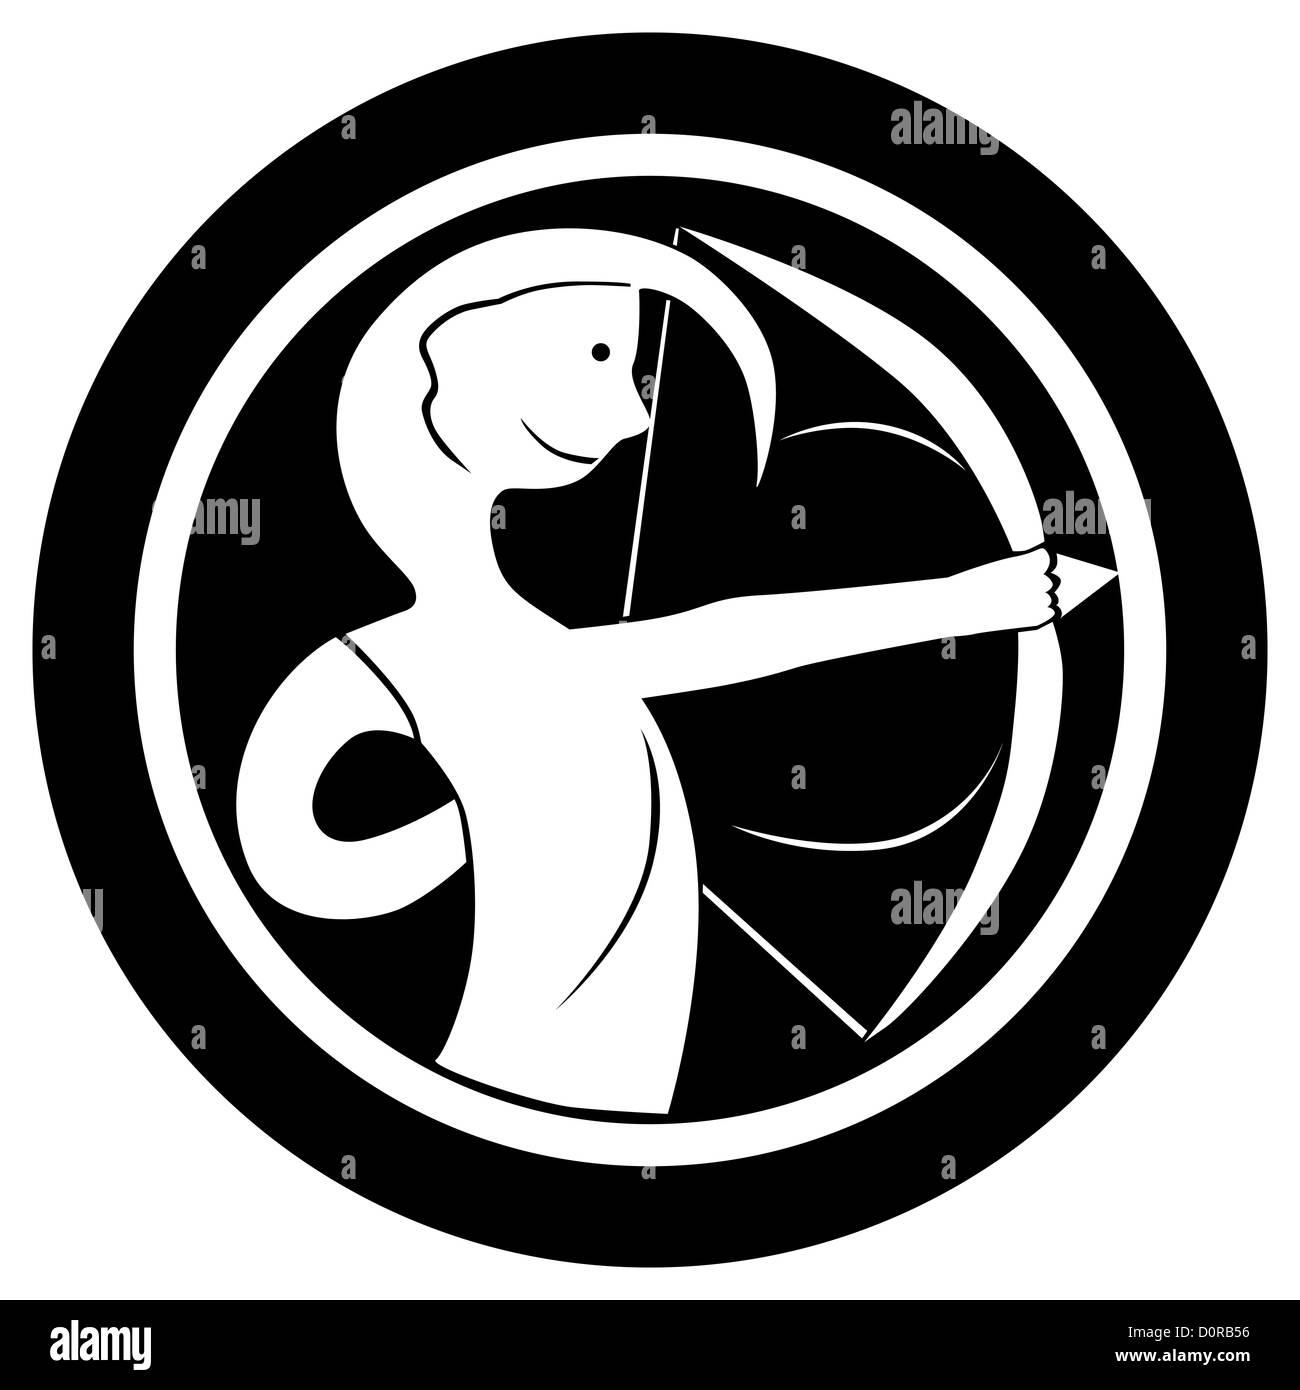 0d09a6ef0f1c7 Zodiac sign, Sagittarius tattoo Stock Photo: 52144770 - Alamy